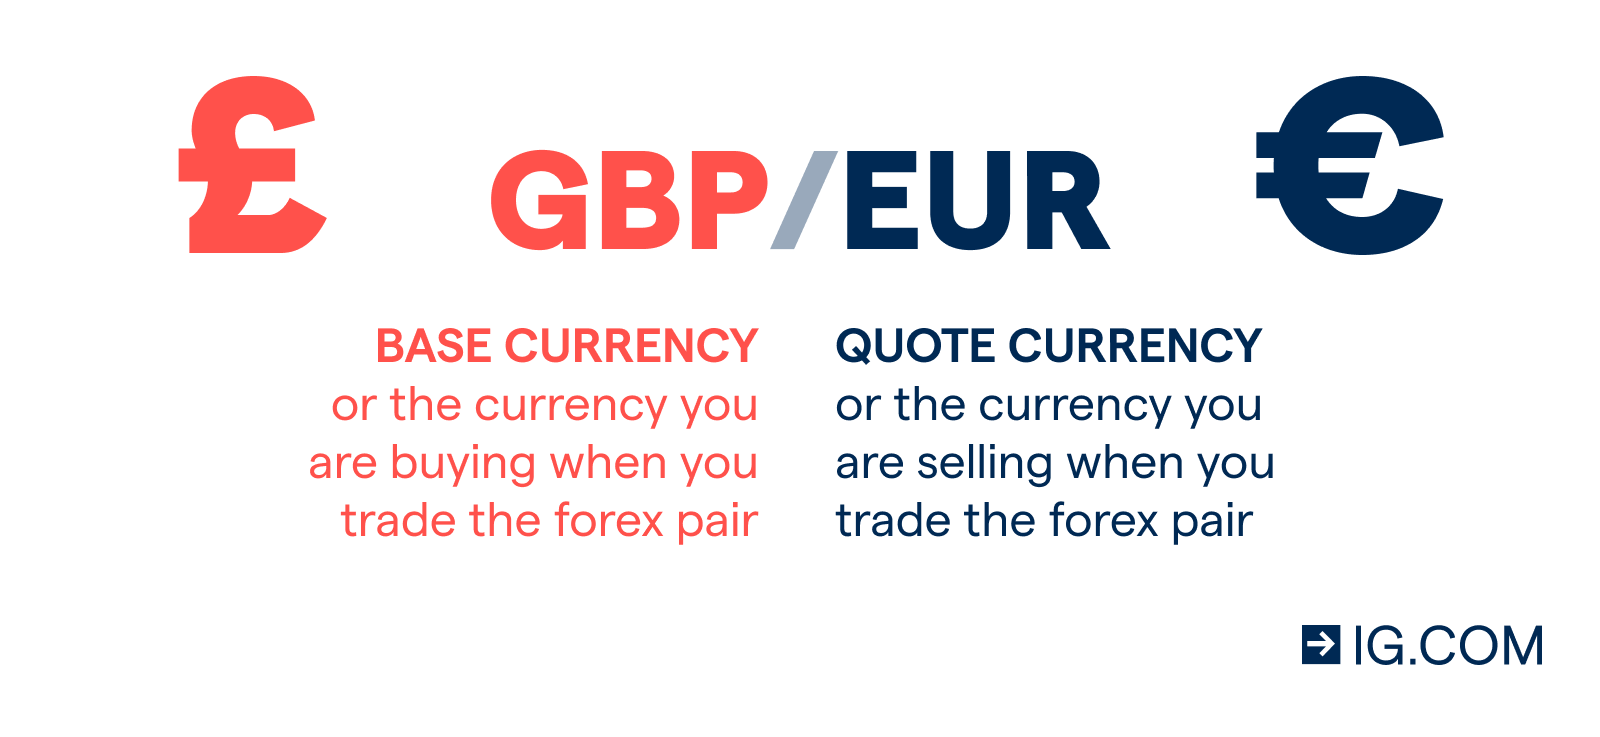 spot fx trading ex-goldman-säcke investieren in krypto